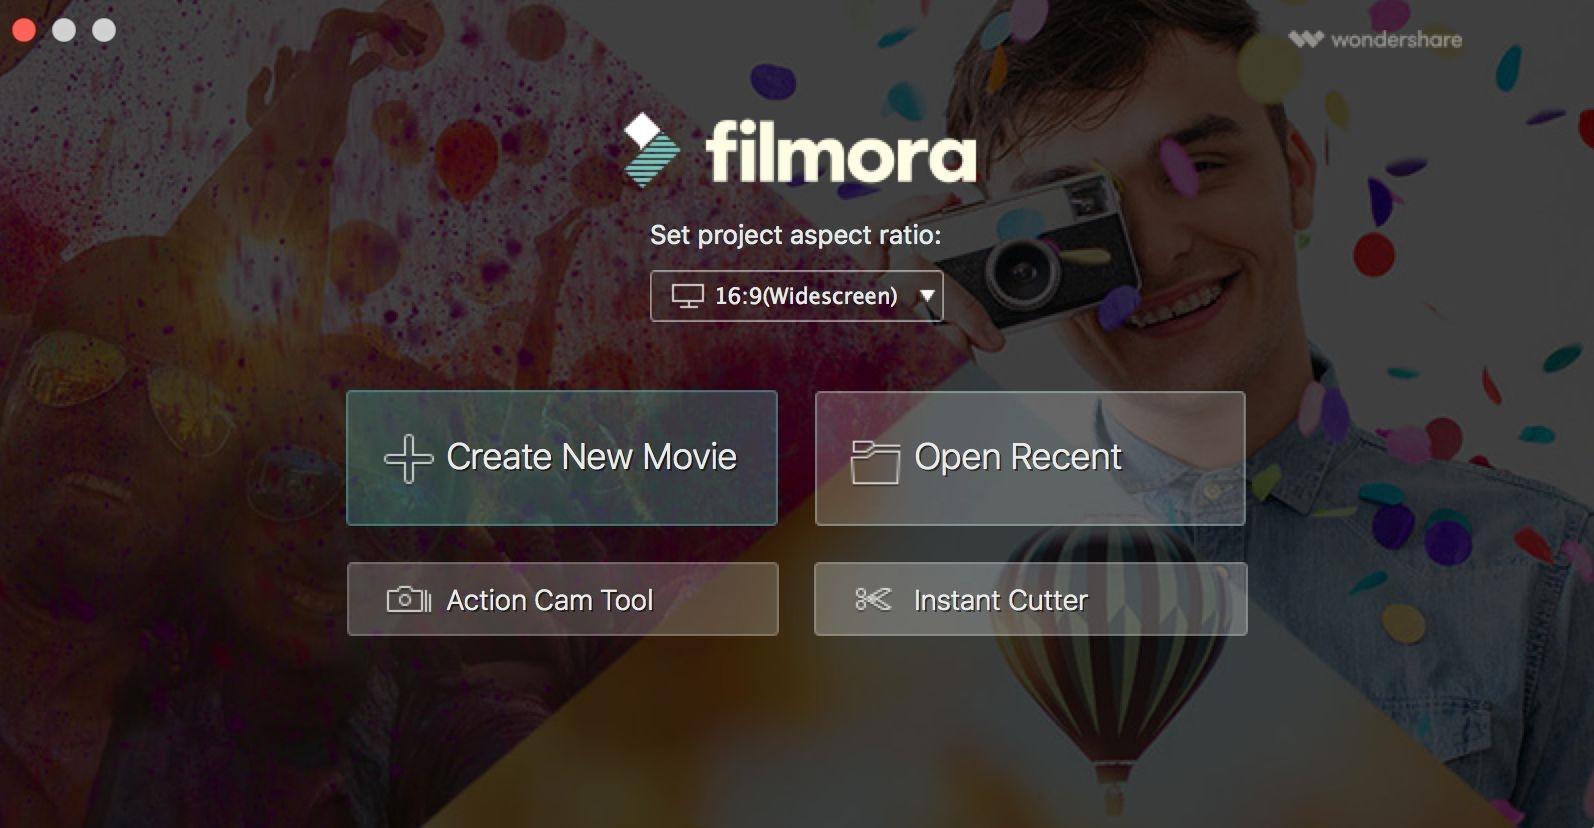 Wondershare Filmora Review: Simple Yet Best Video Editor | DeviceDaily.com